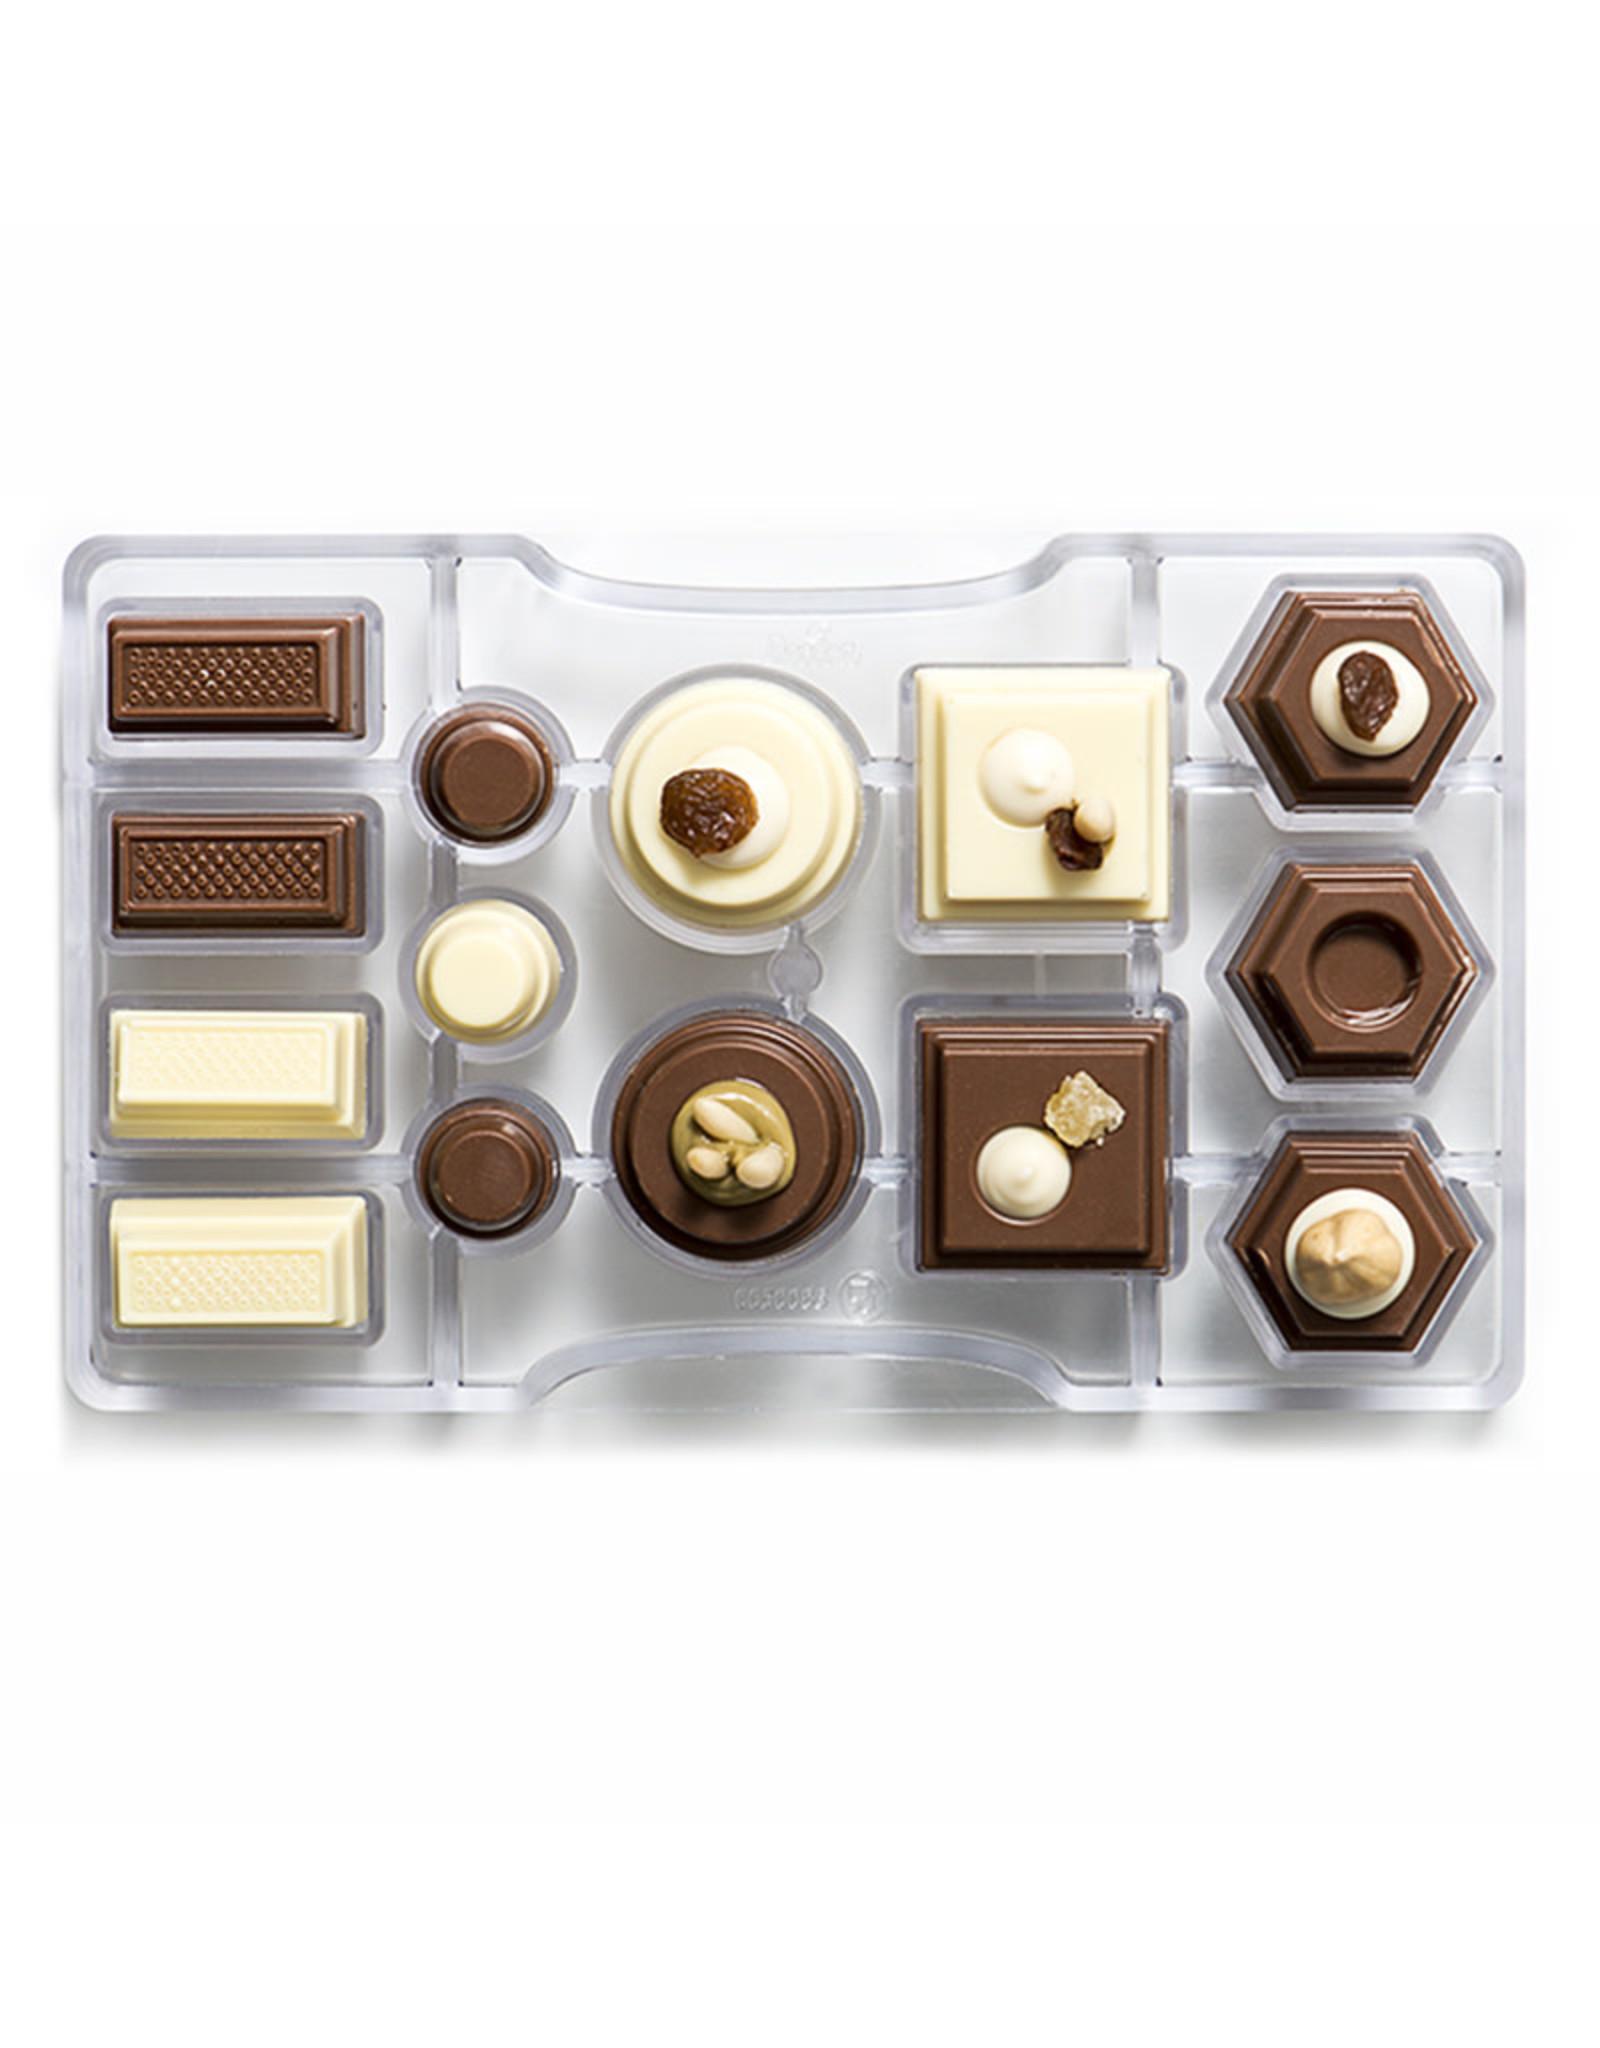 Decora Chocoladevorm polycarbonaat geometrisch